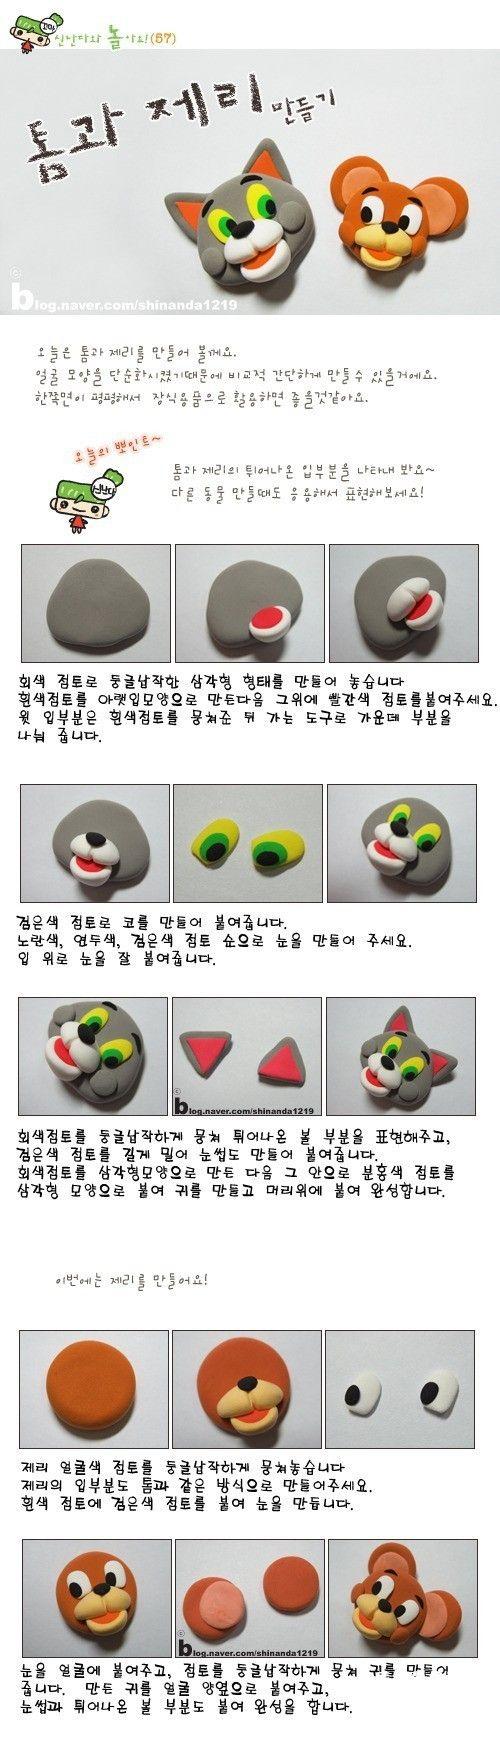 http://www.duitang.com/people/mblog/34097396/detail/